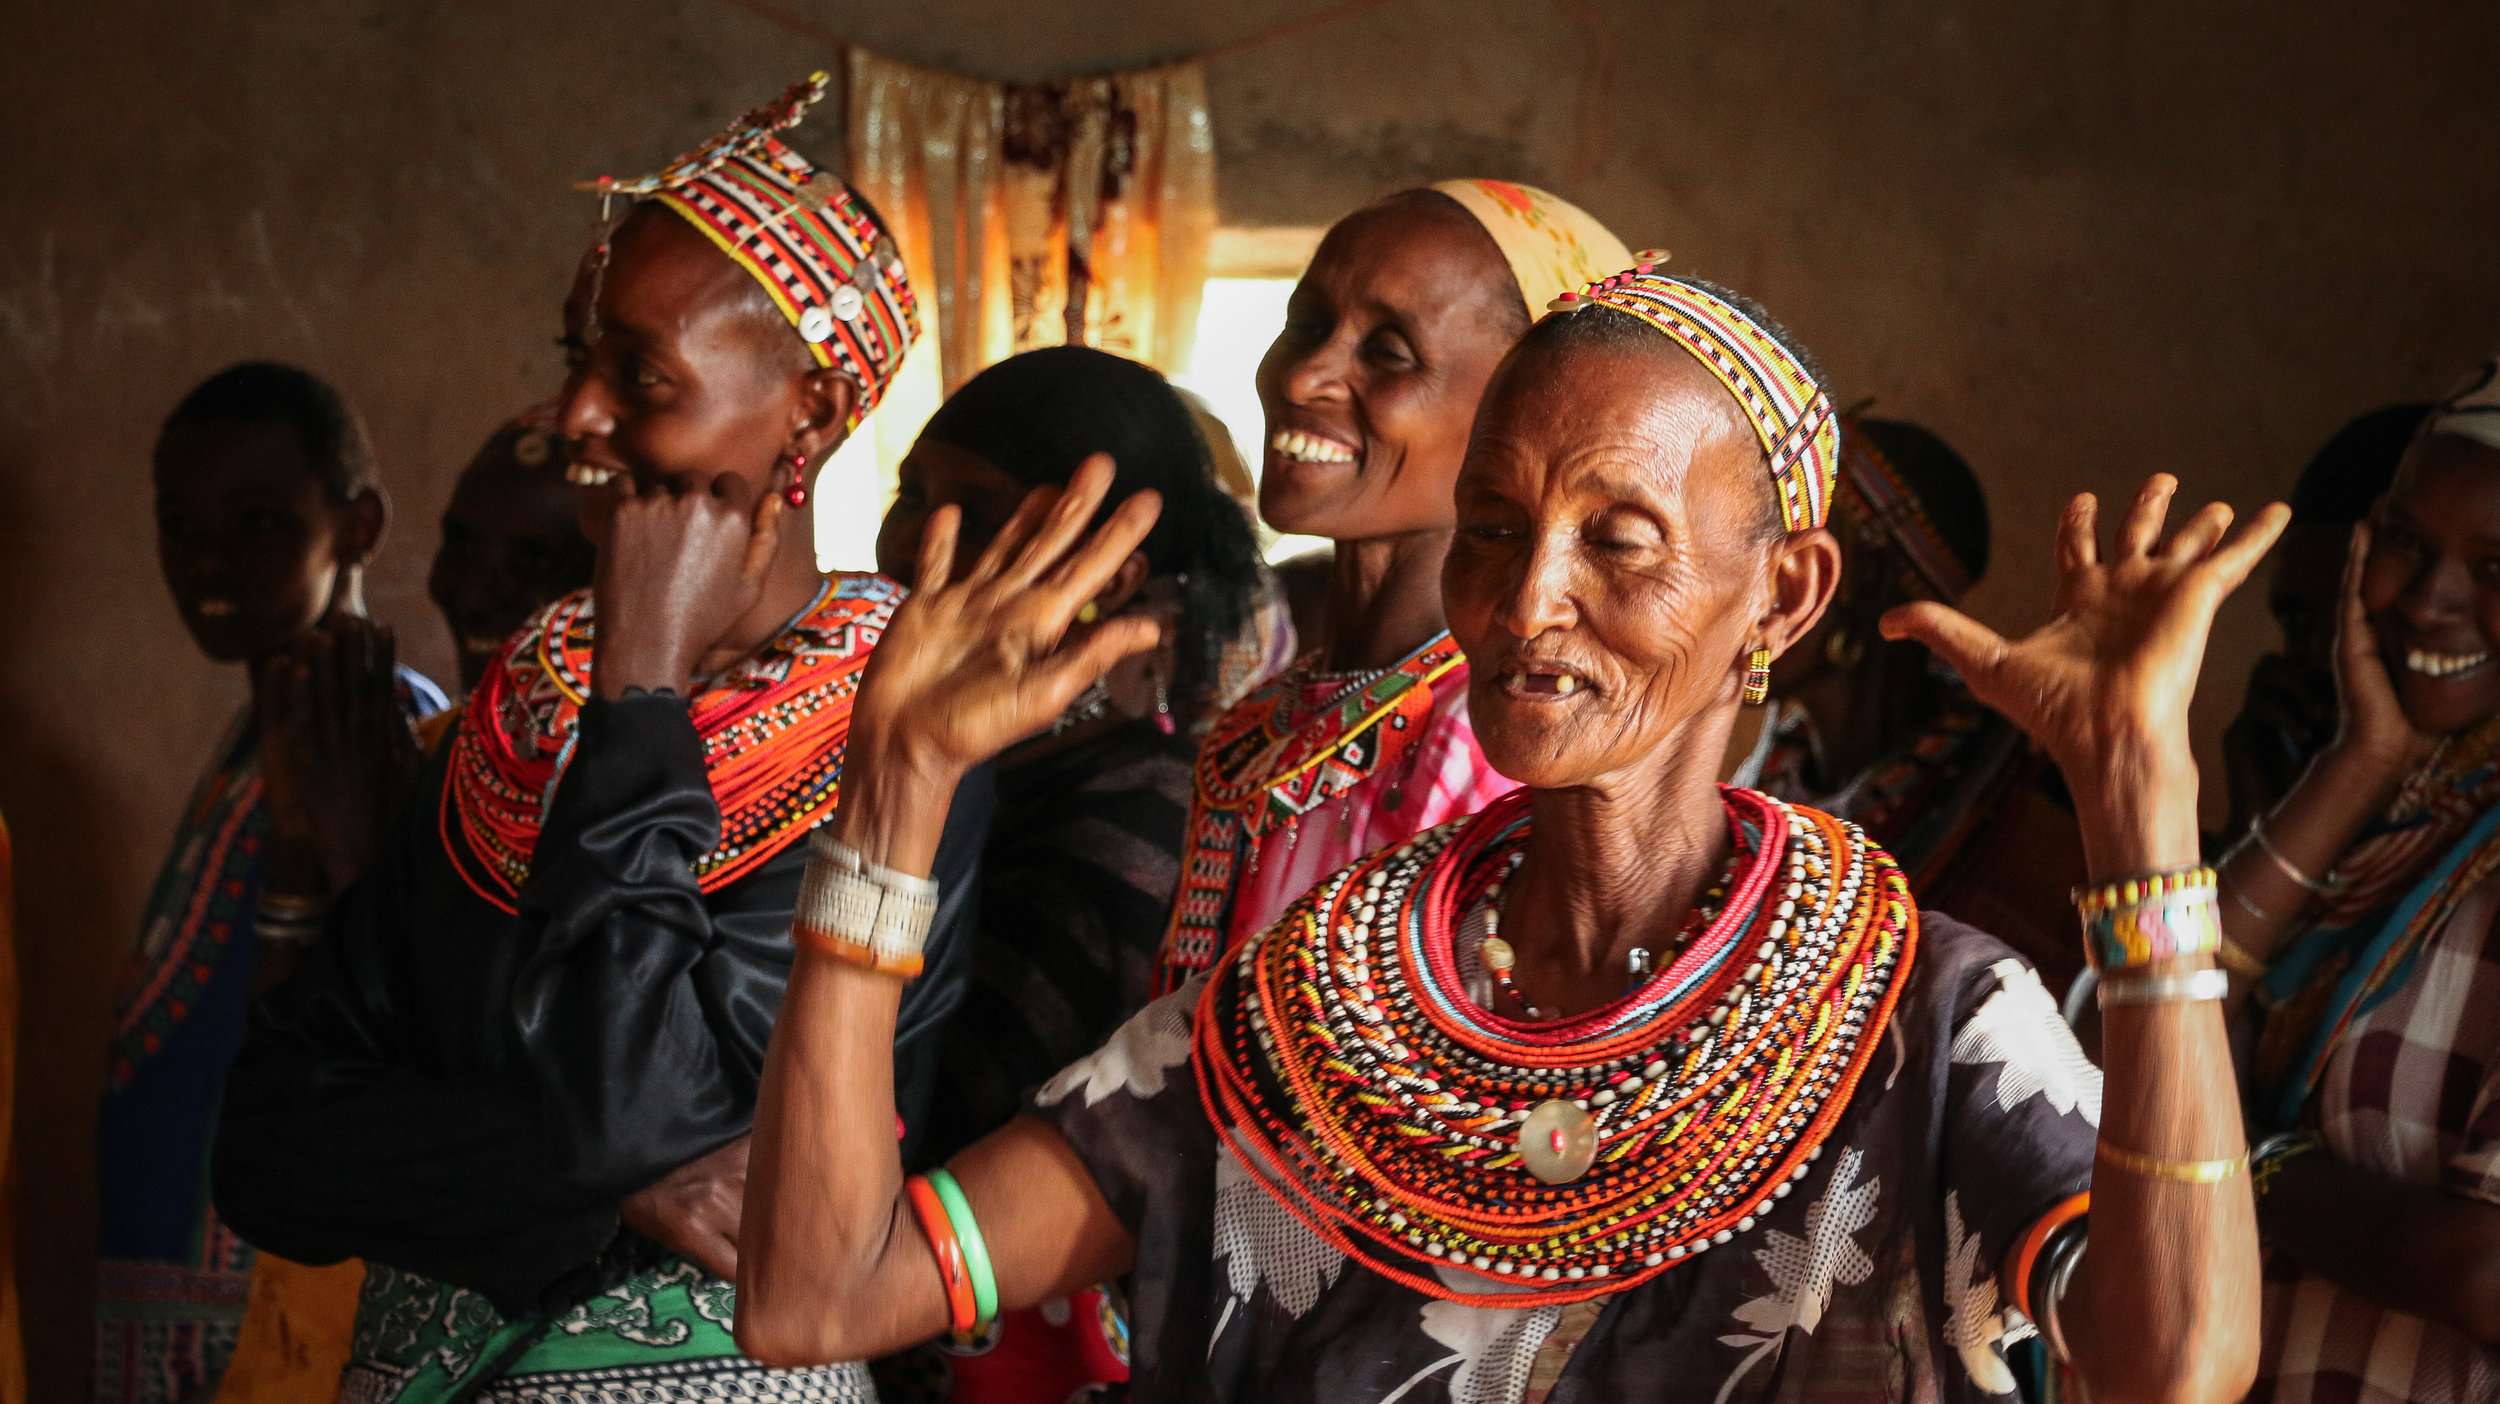 Africa2017-37.jpg